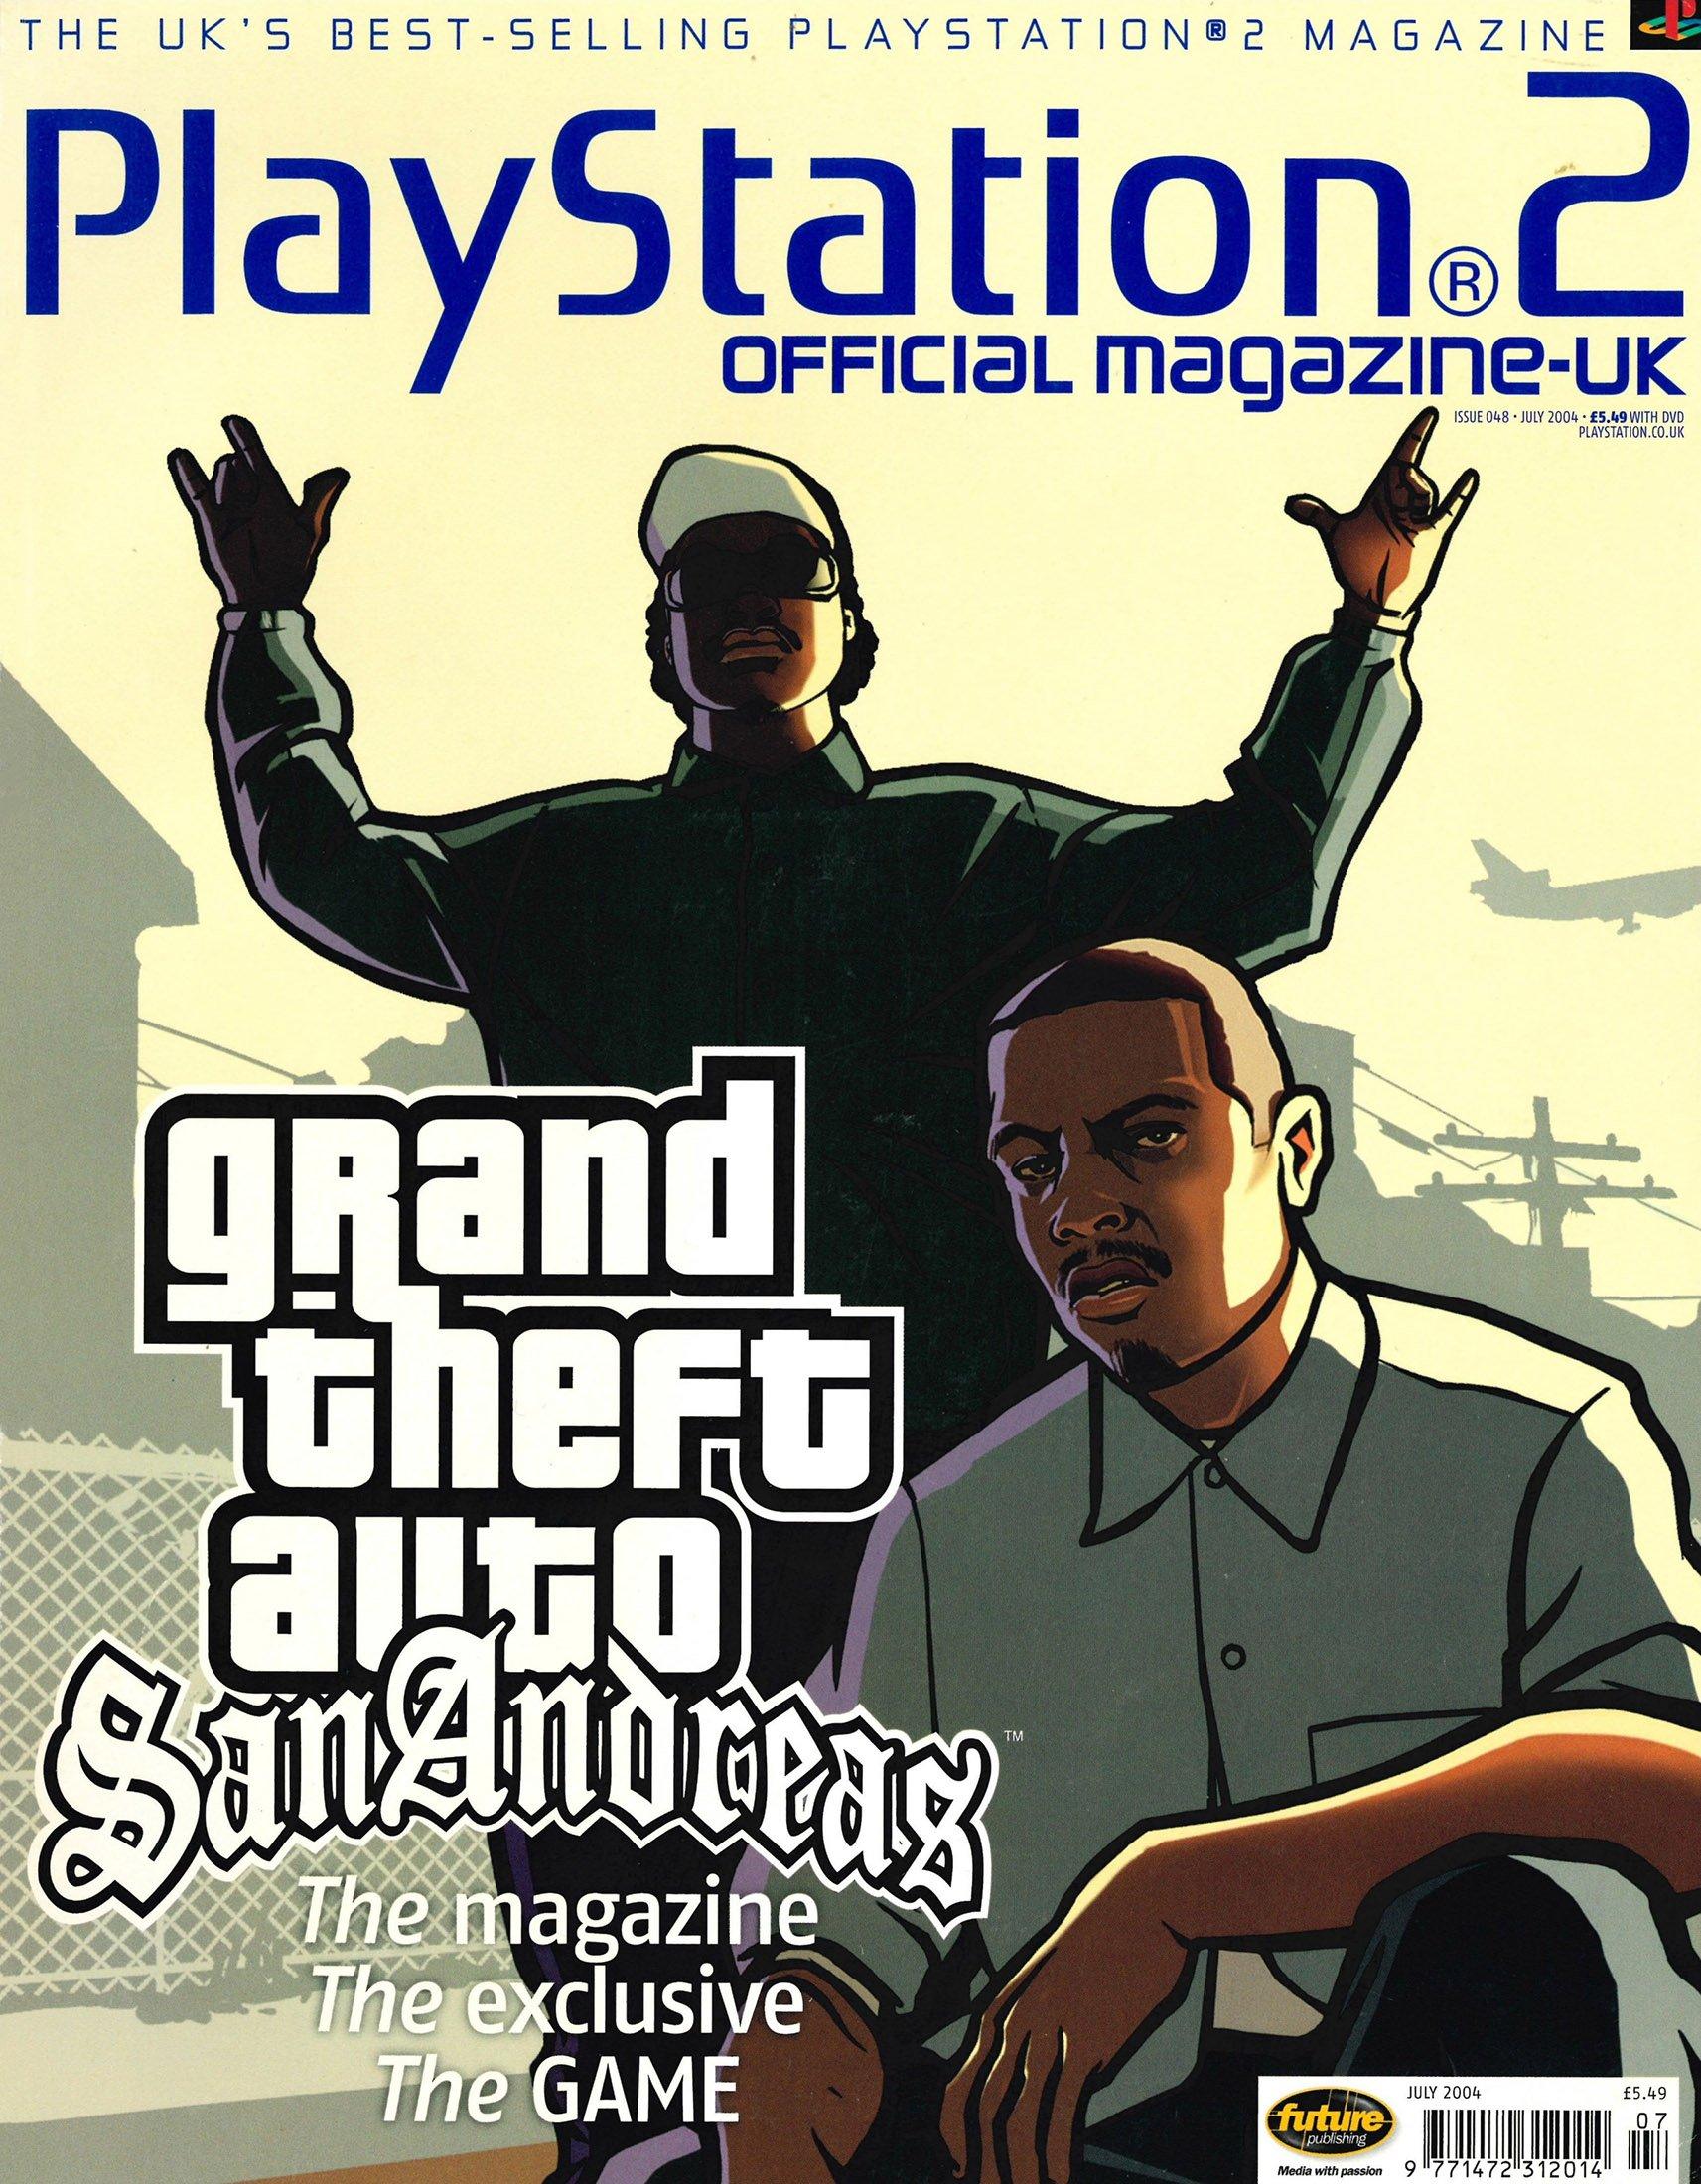 Official Playstation 2 Magazine UK 048 (July 2004)